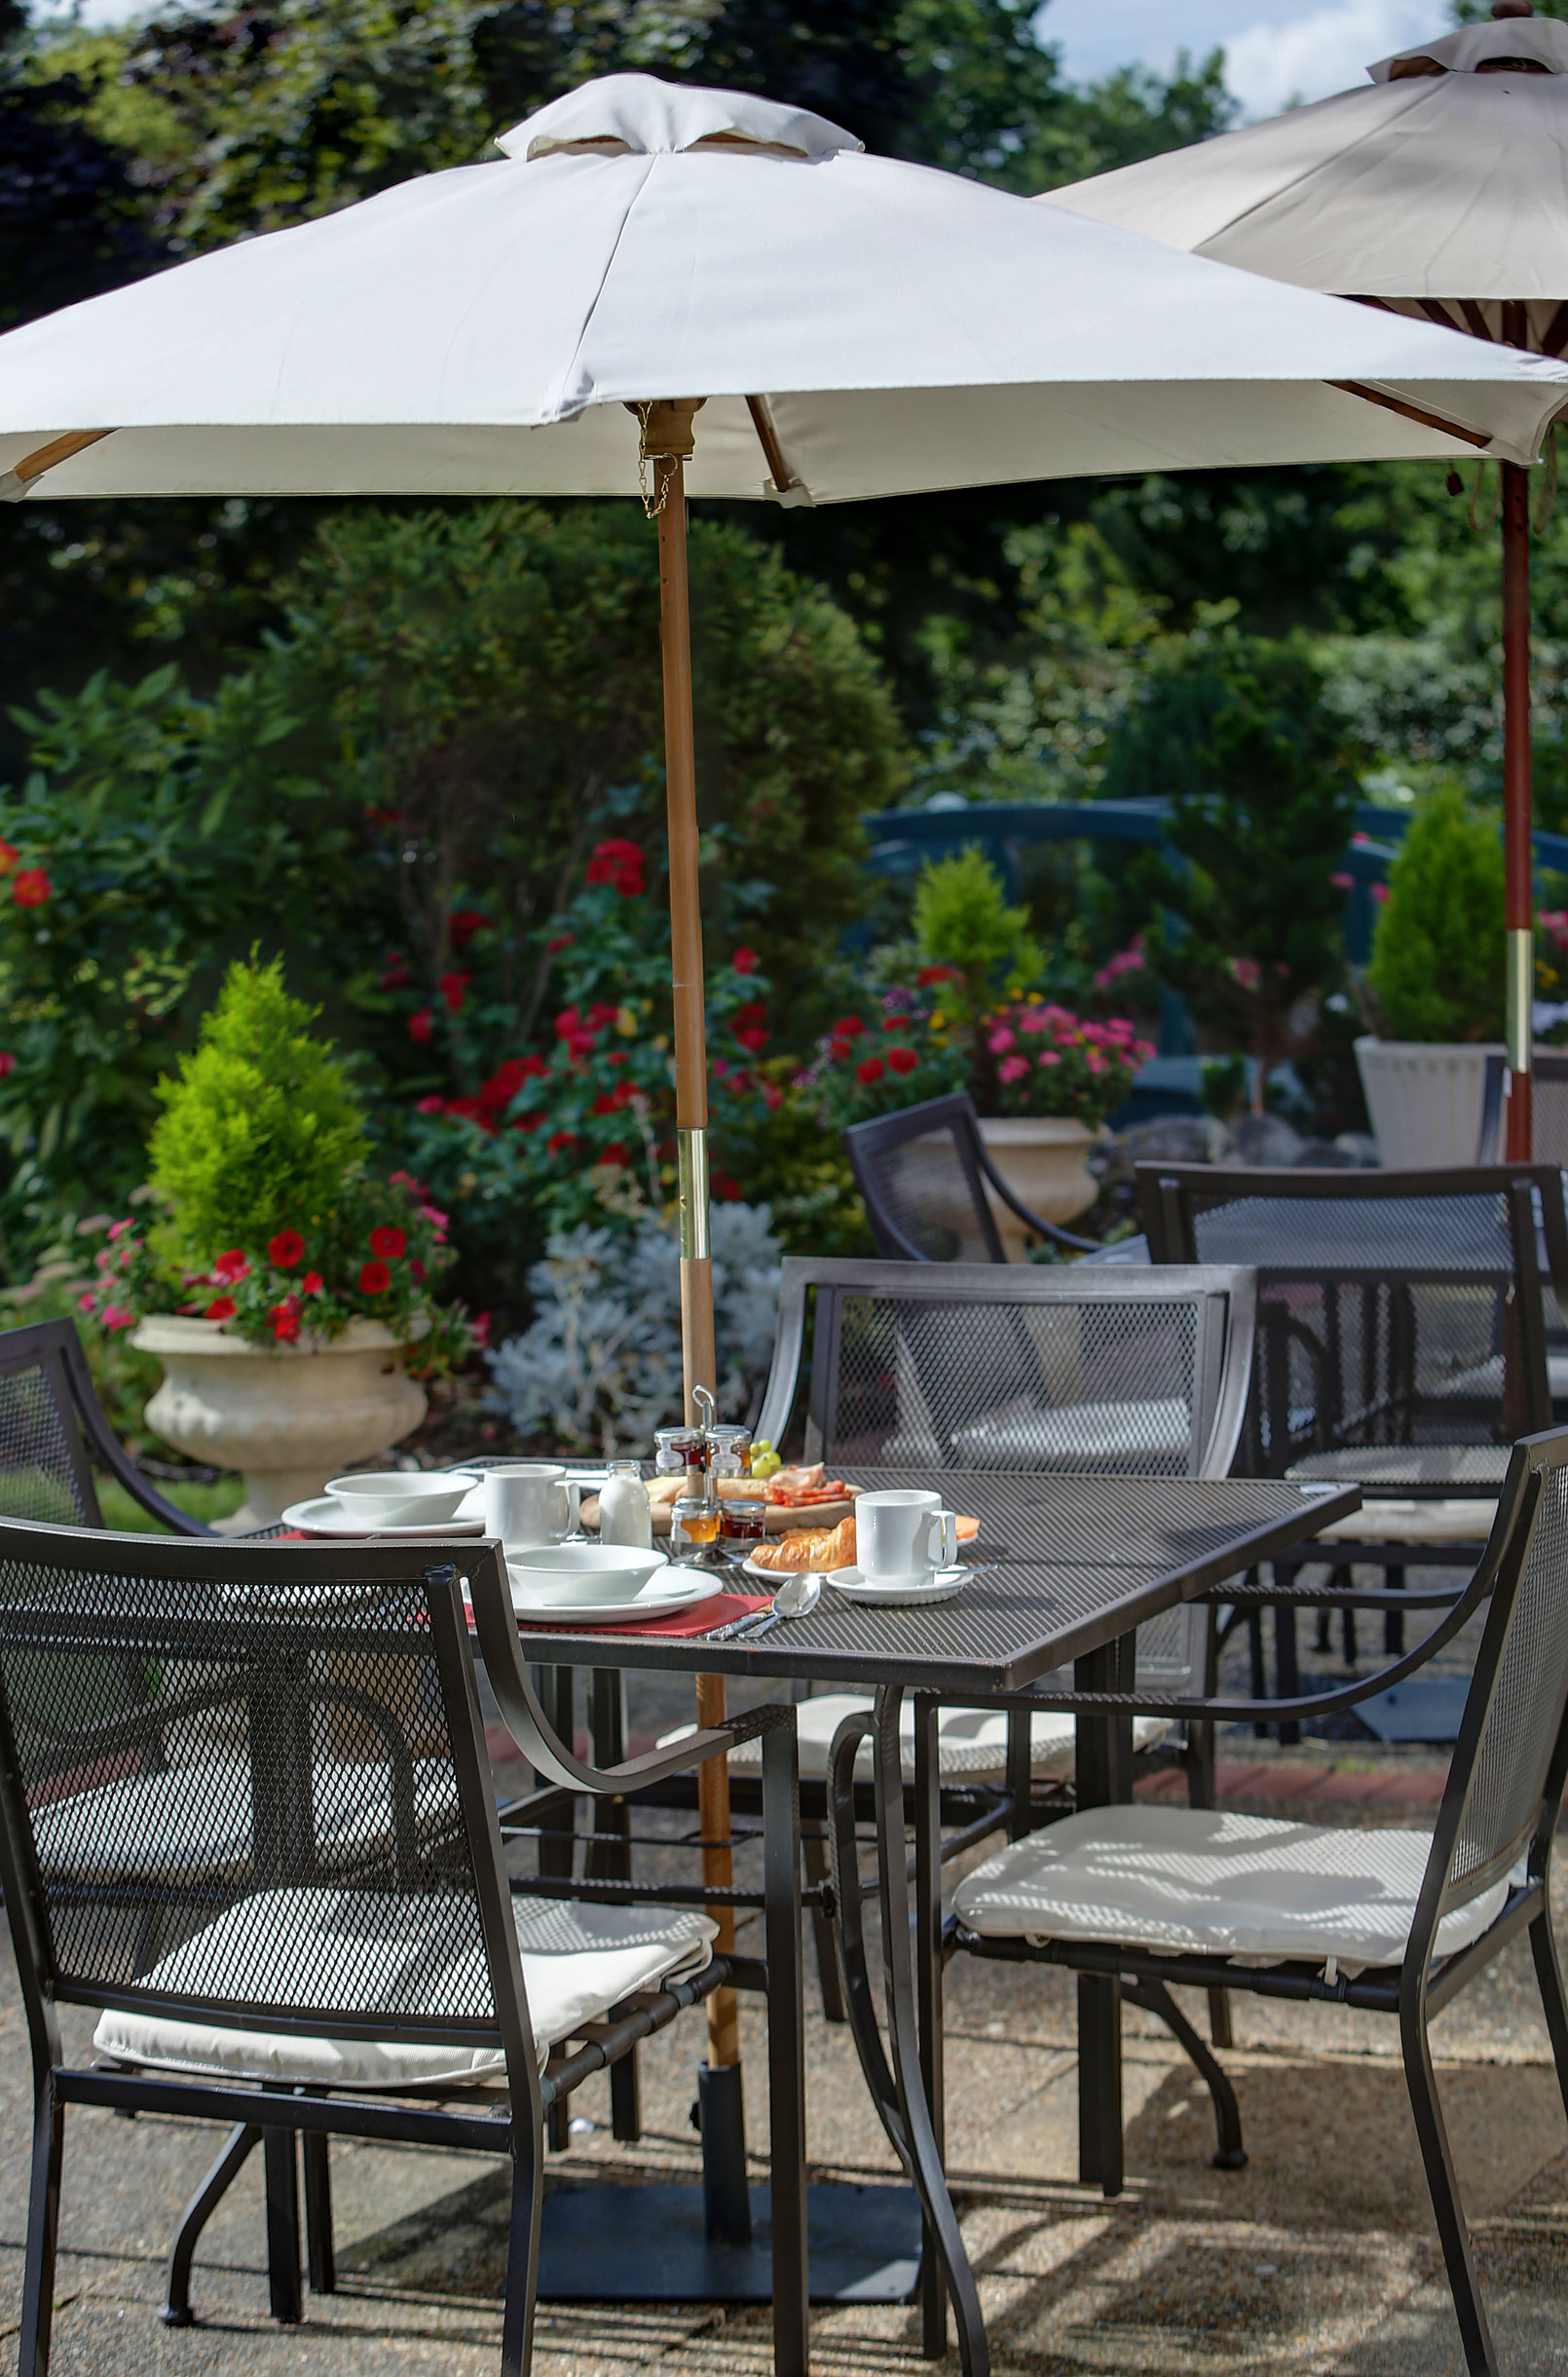 Best Western Hotel Room: Best Western Welwyn Garden City Homestead Court Hotel